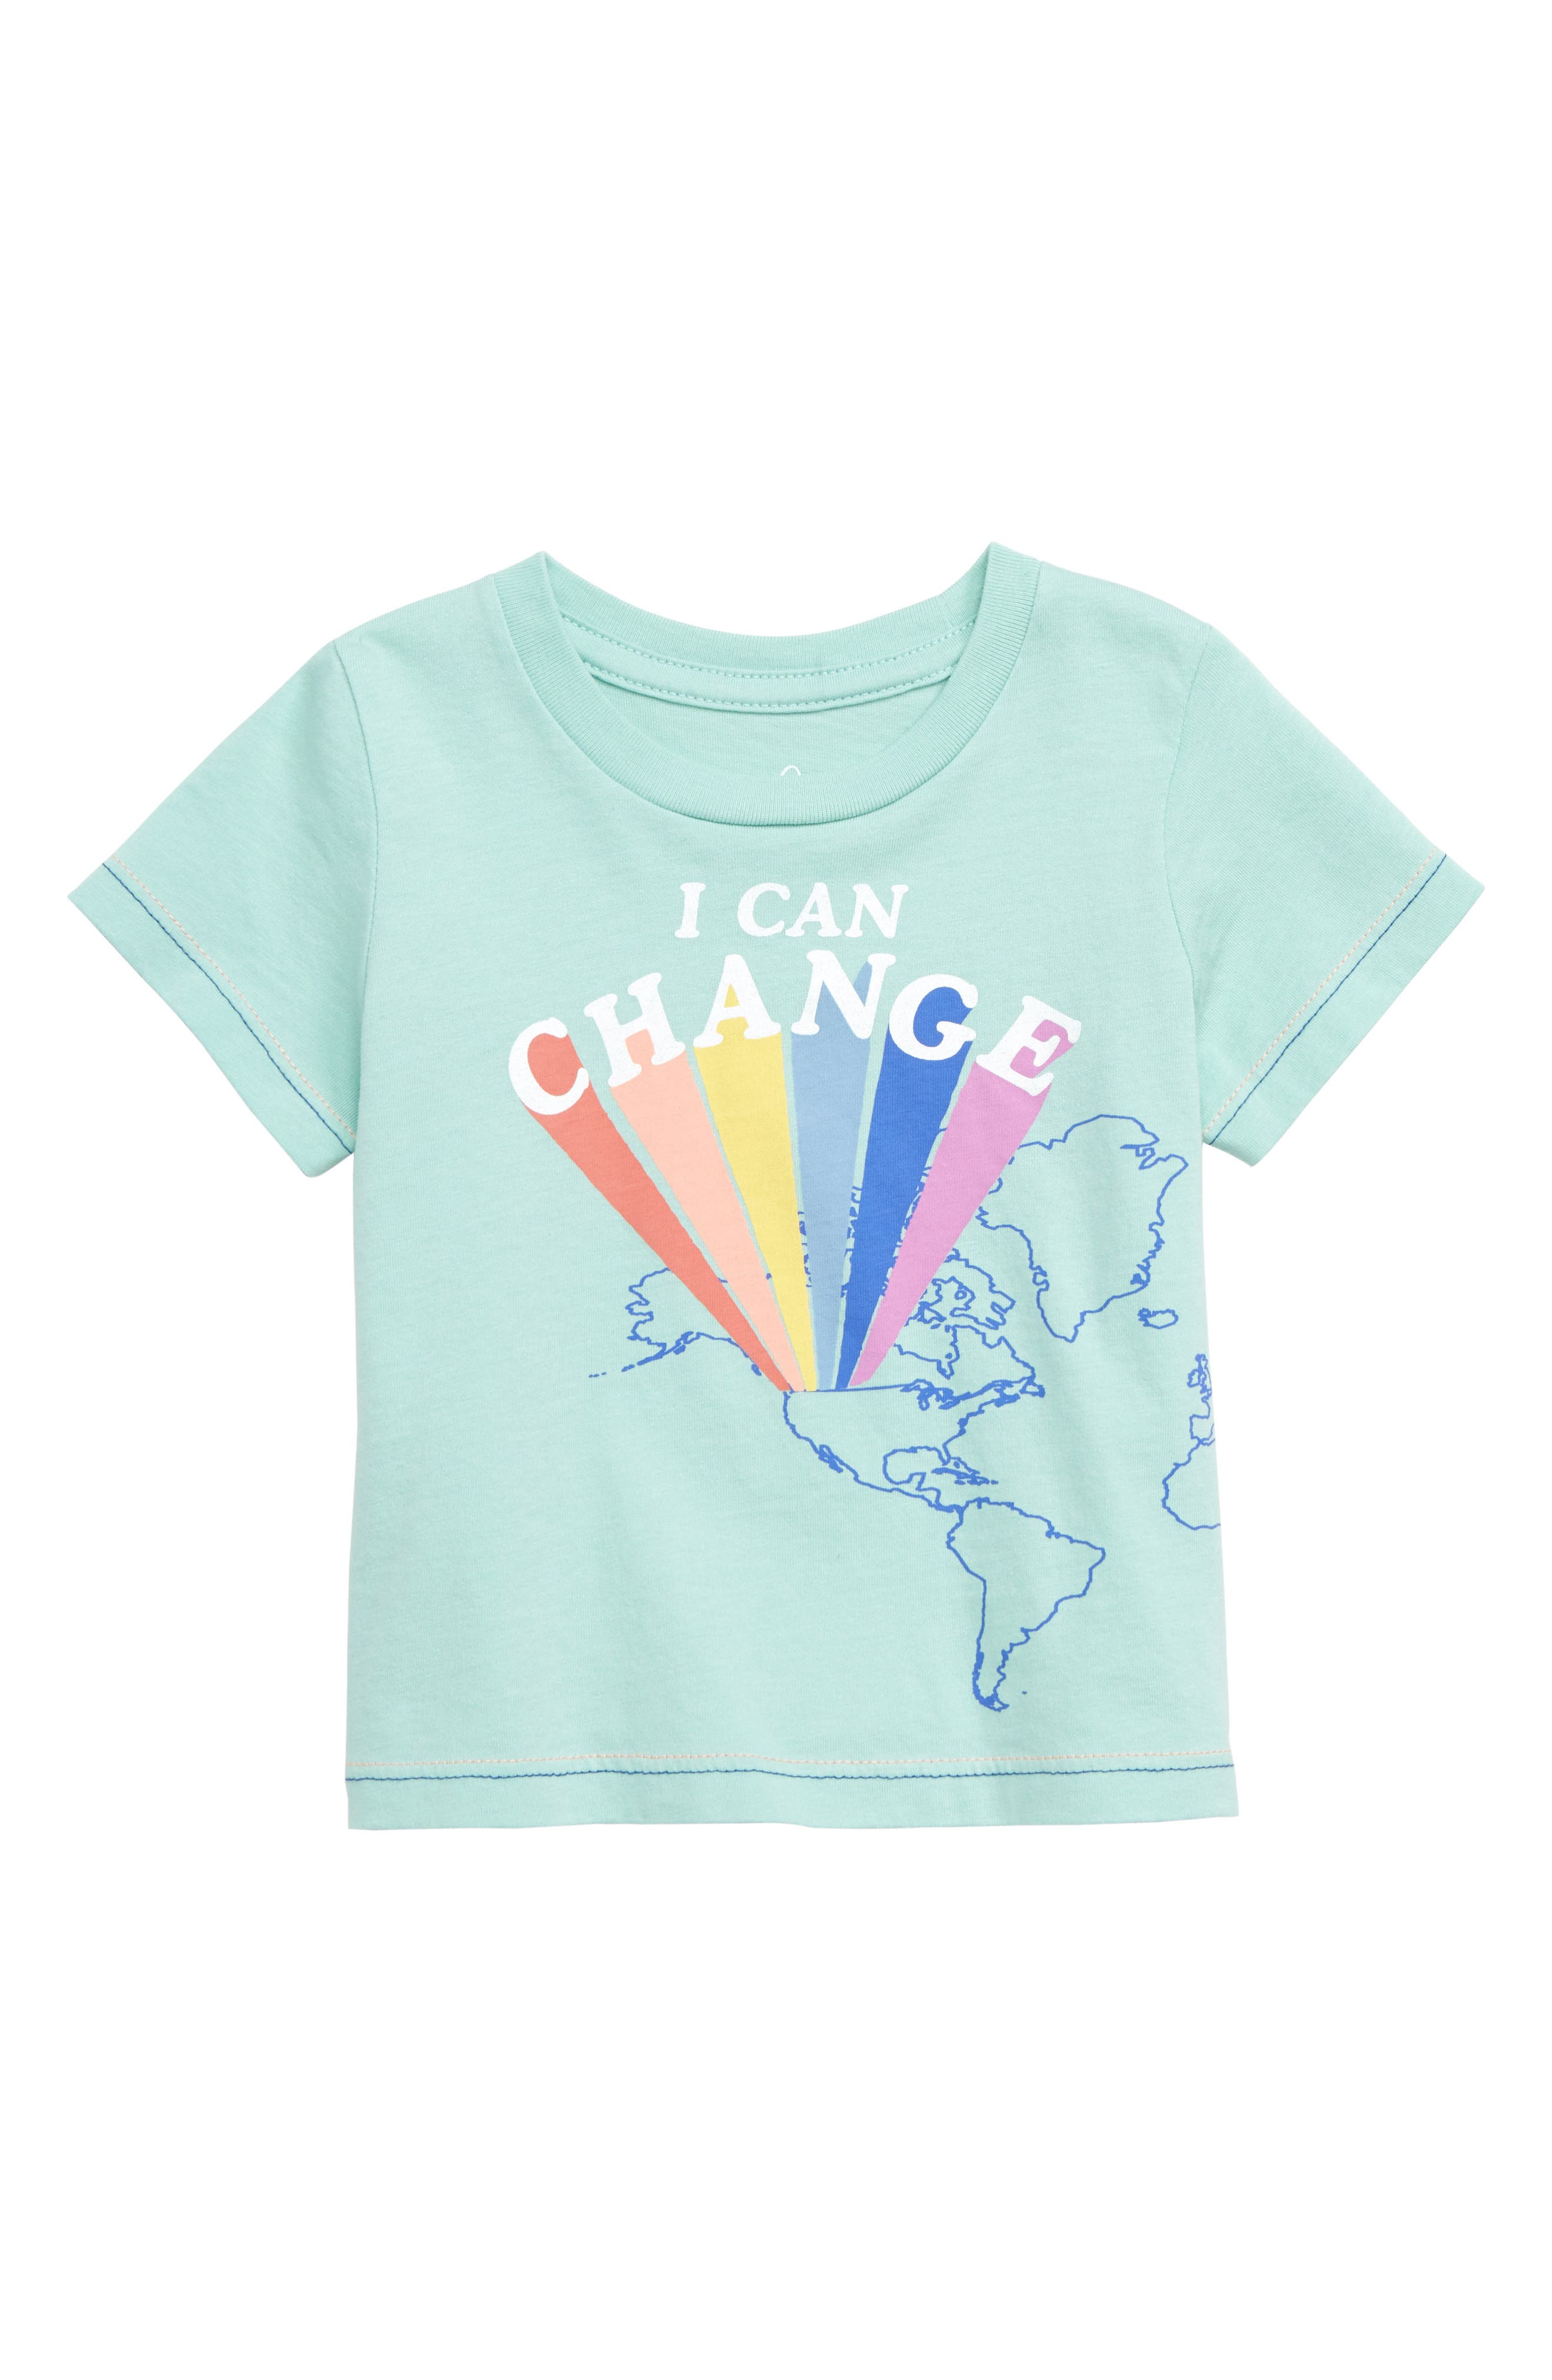 PEEK ESSENTIALS,                             Peek Change the World Graphic T-Shirt,                             Main thumbnail 1, color,                             BLUE